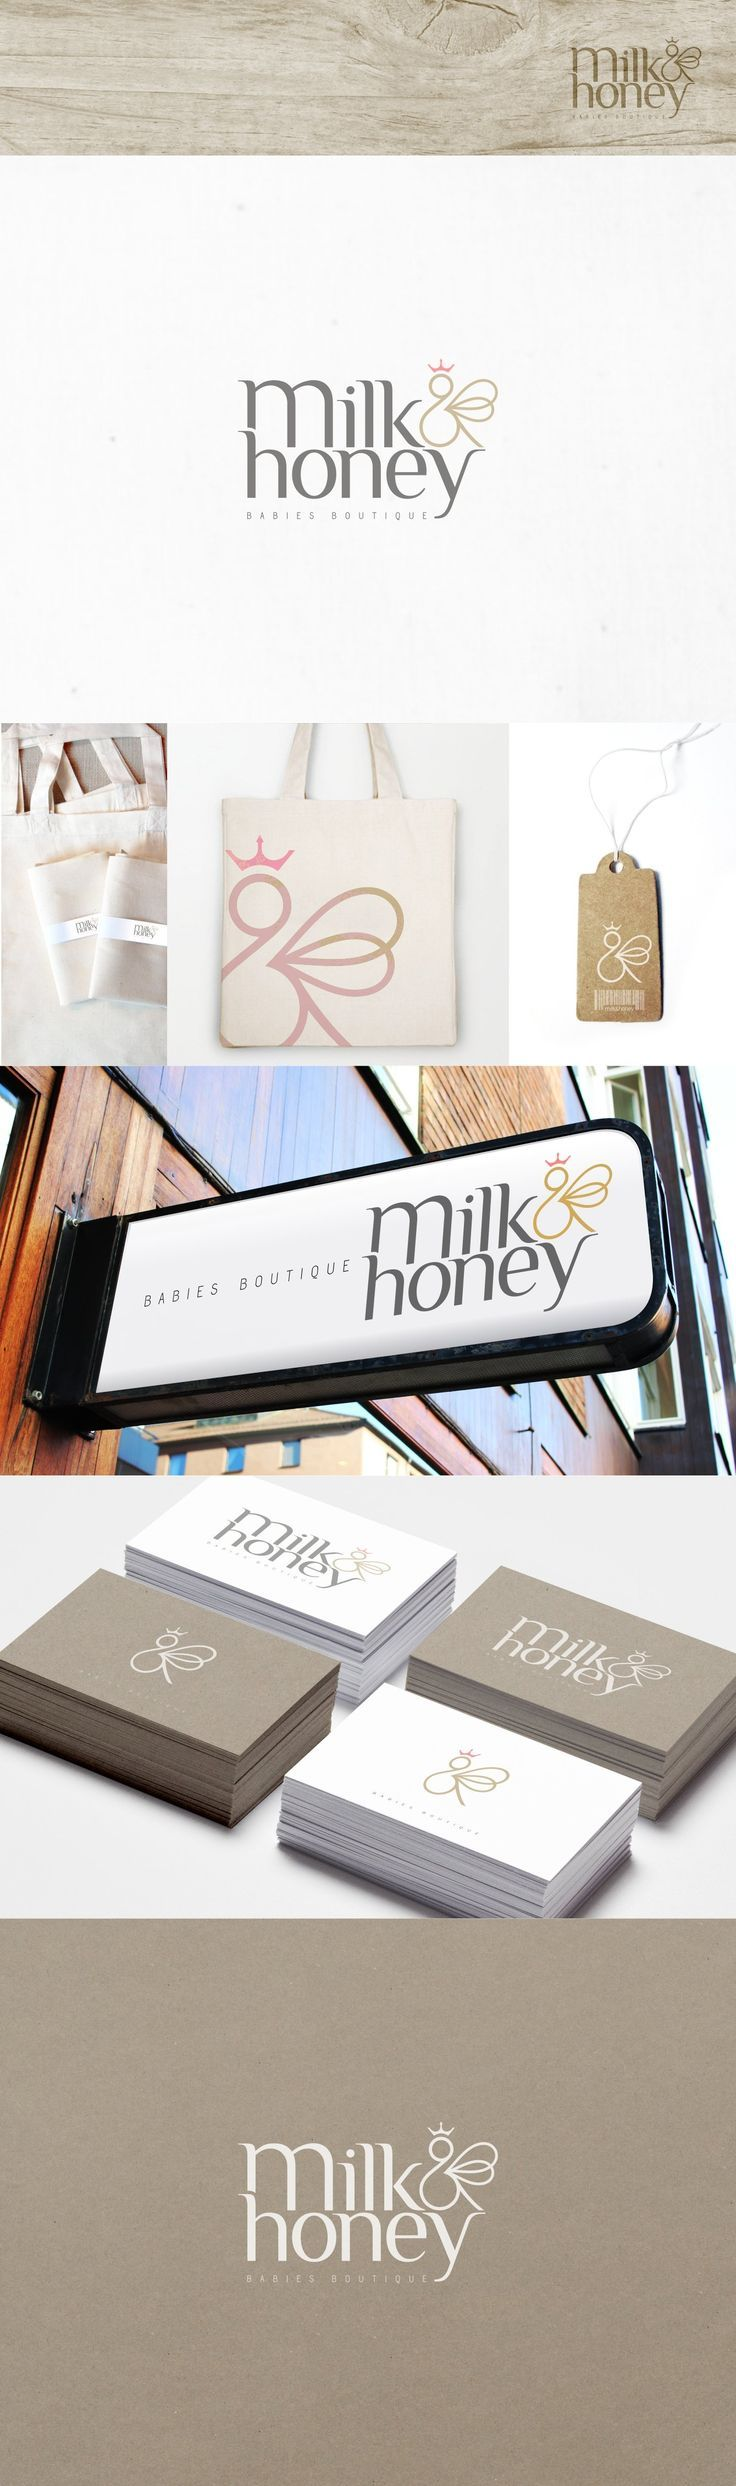 milk&honey logo and branding